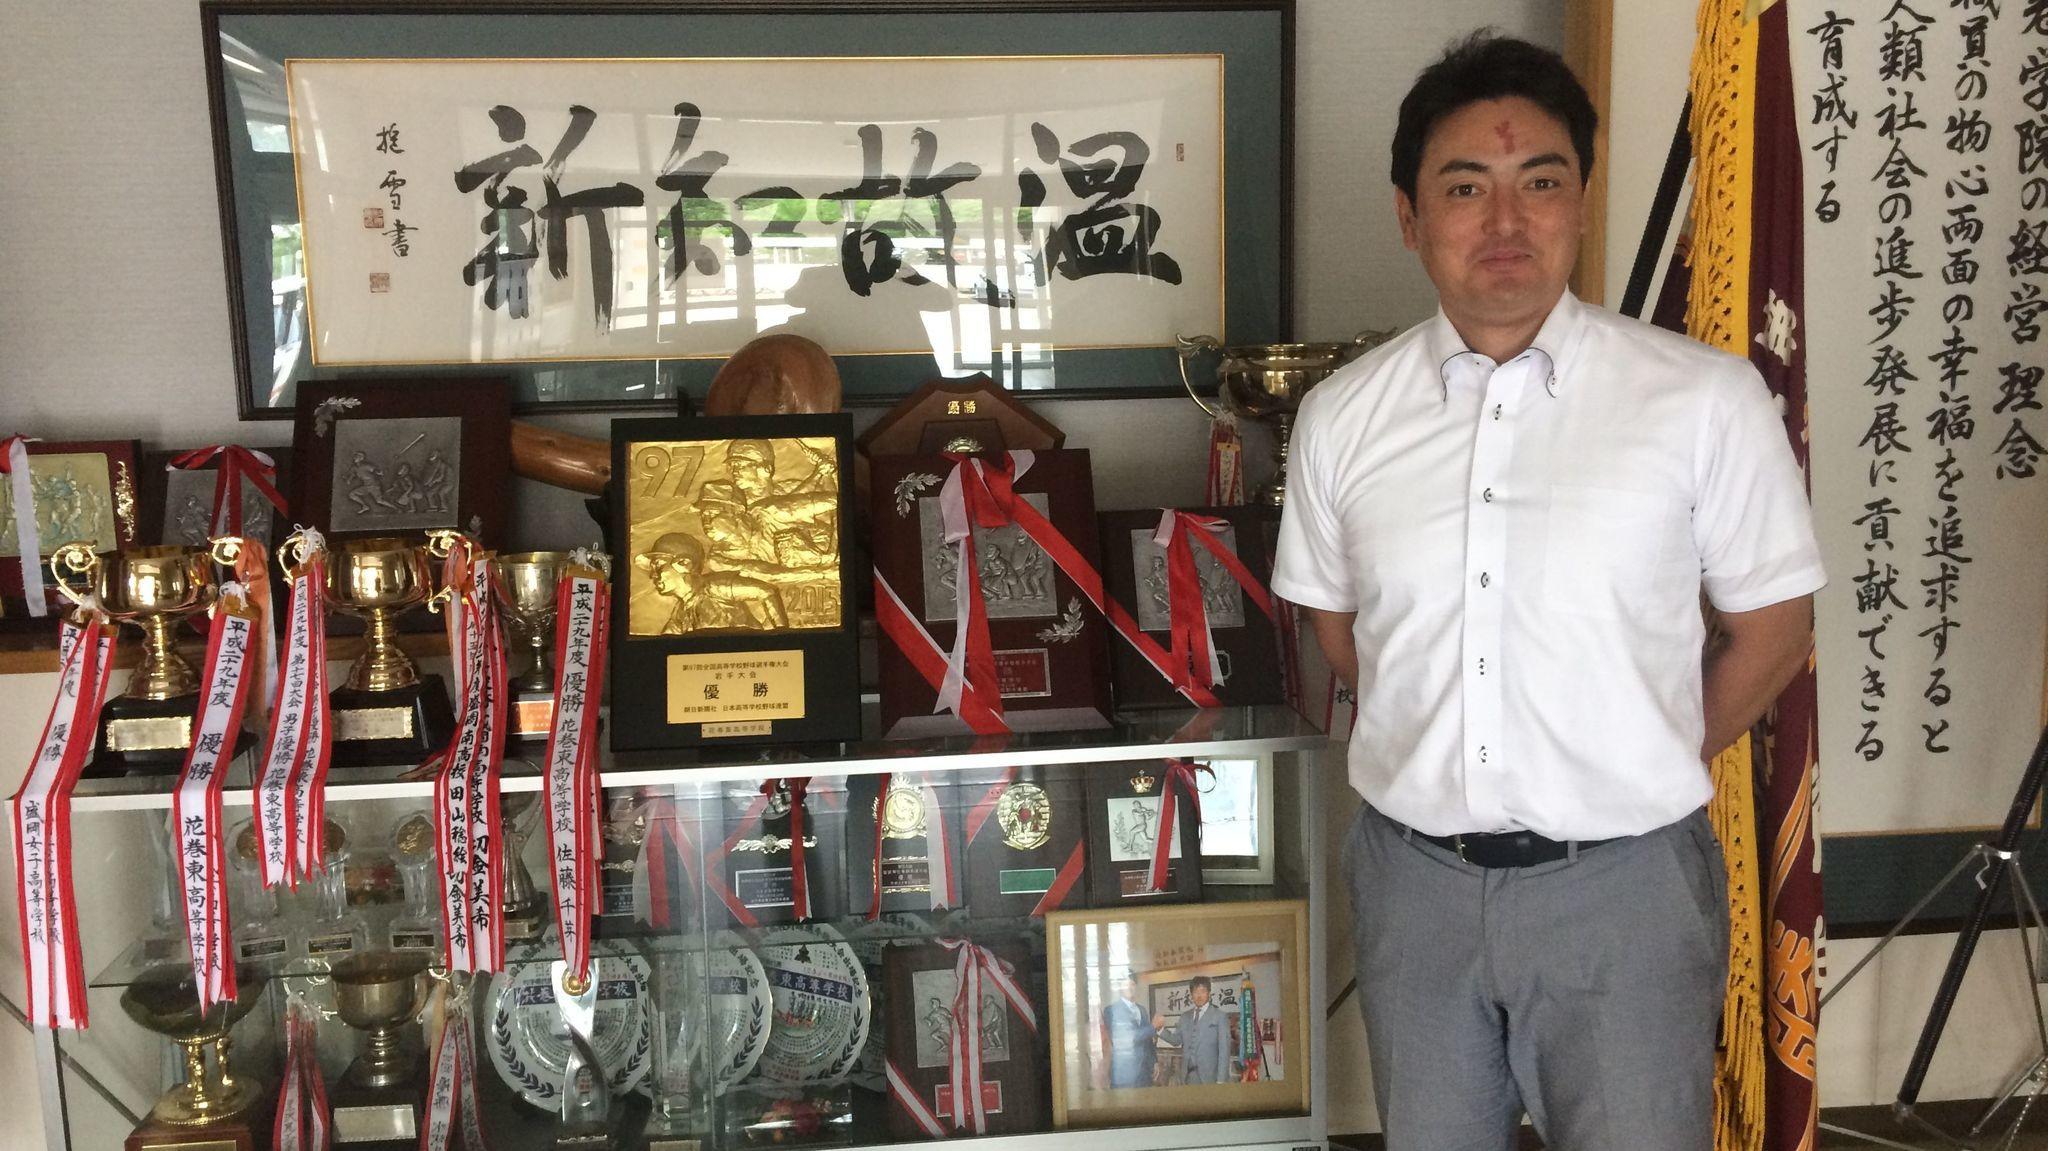 Hiroshi Sasaki coaches the Hanamaki Higashi High School baseball team, where Shohei Ohtani played.